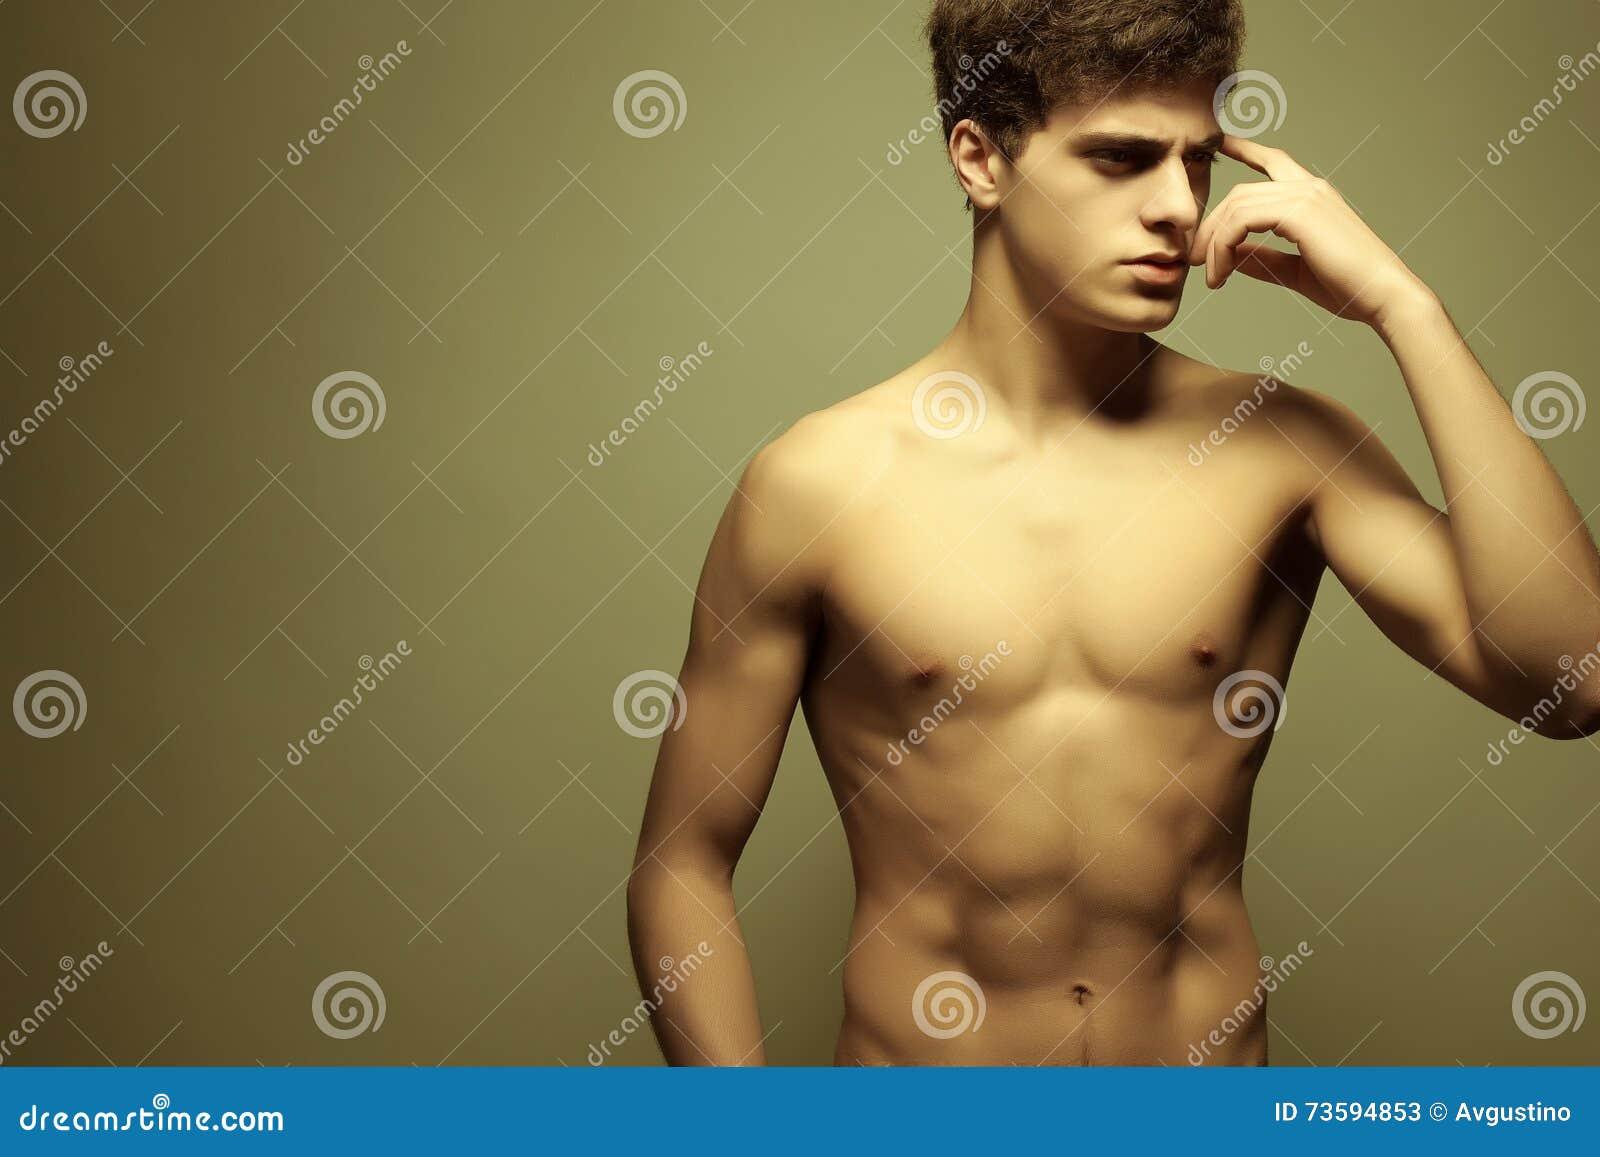 Nice male body pics